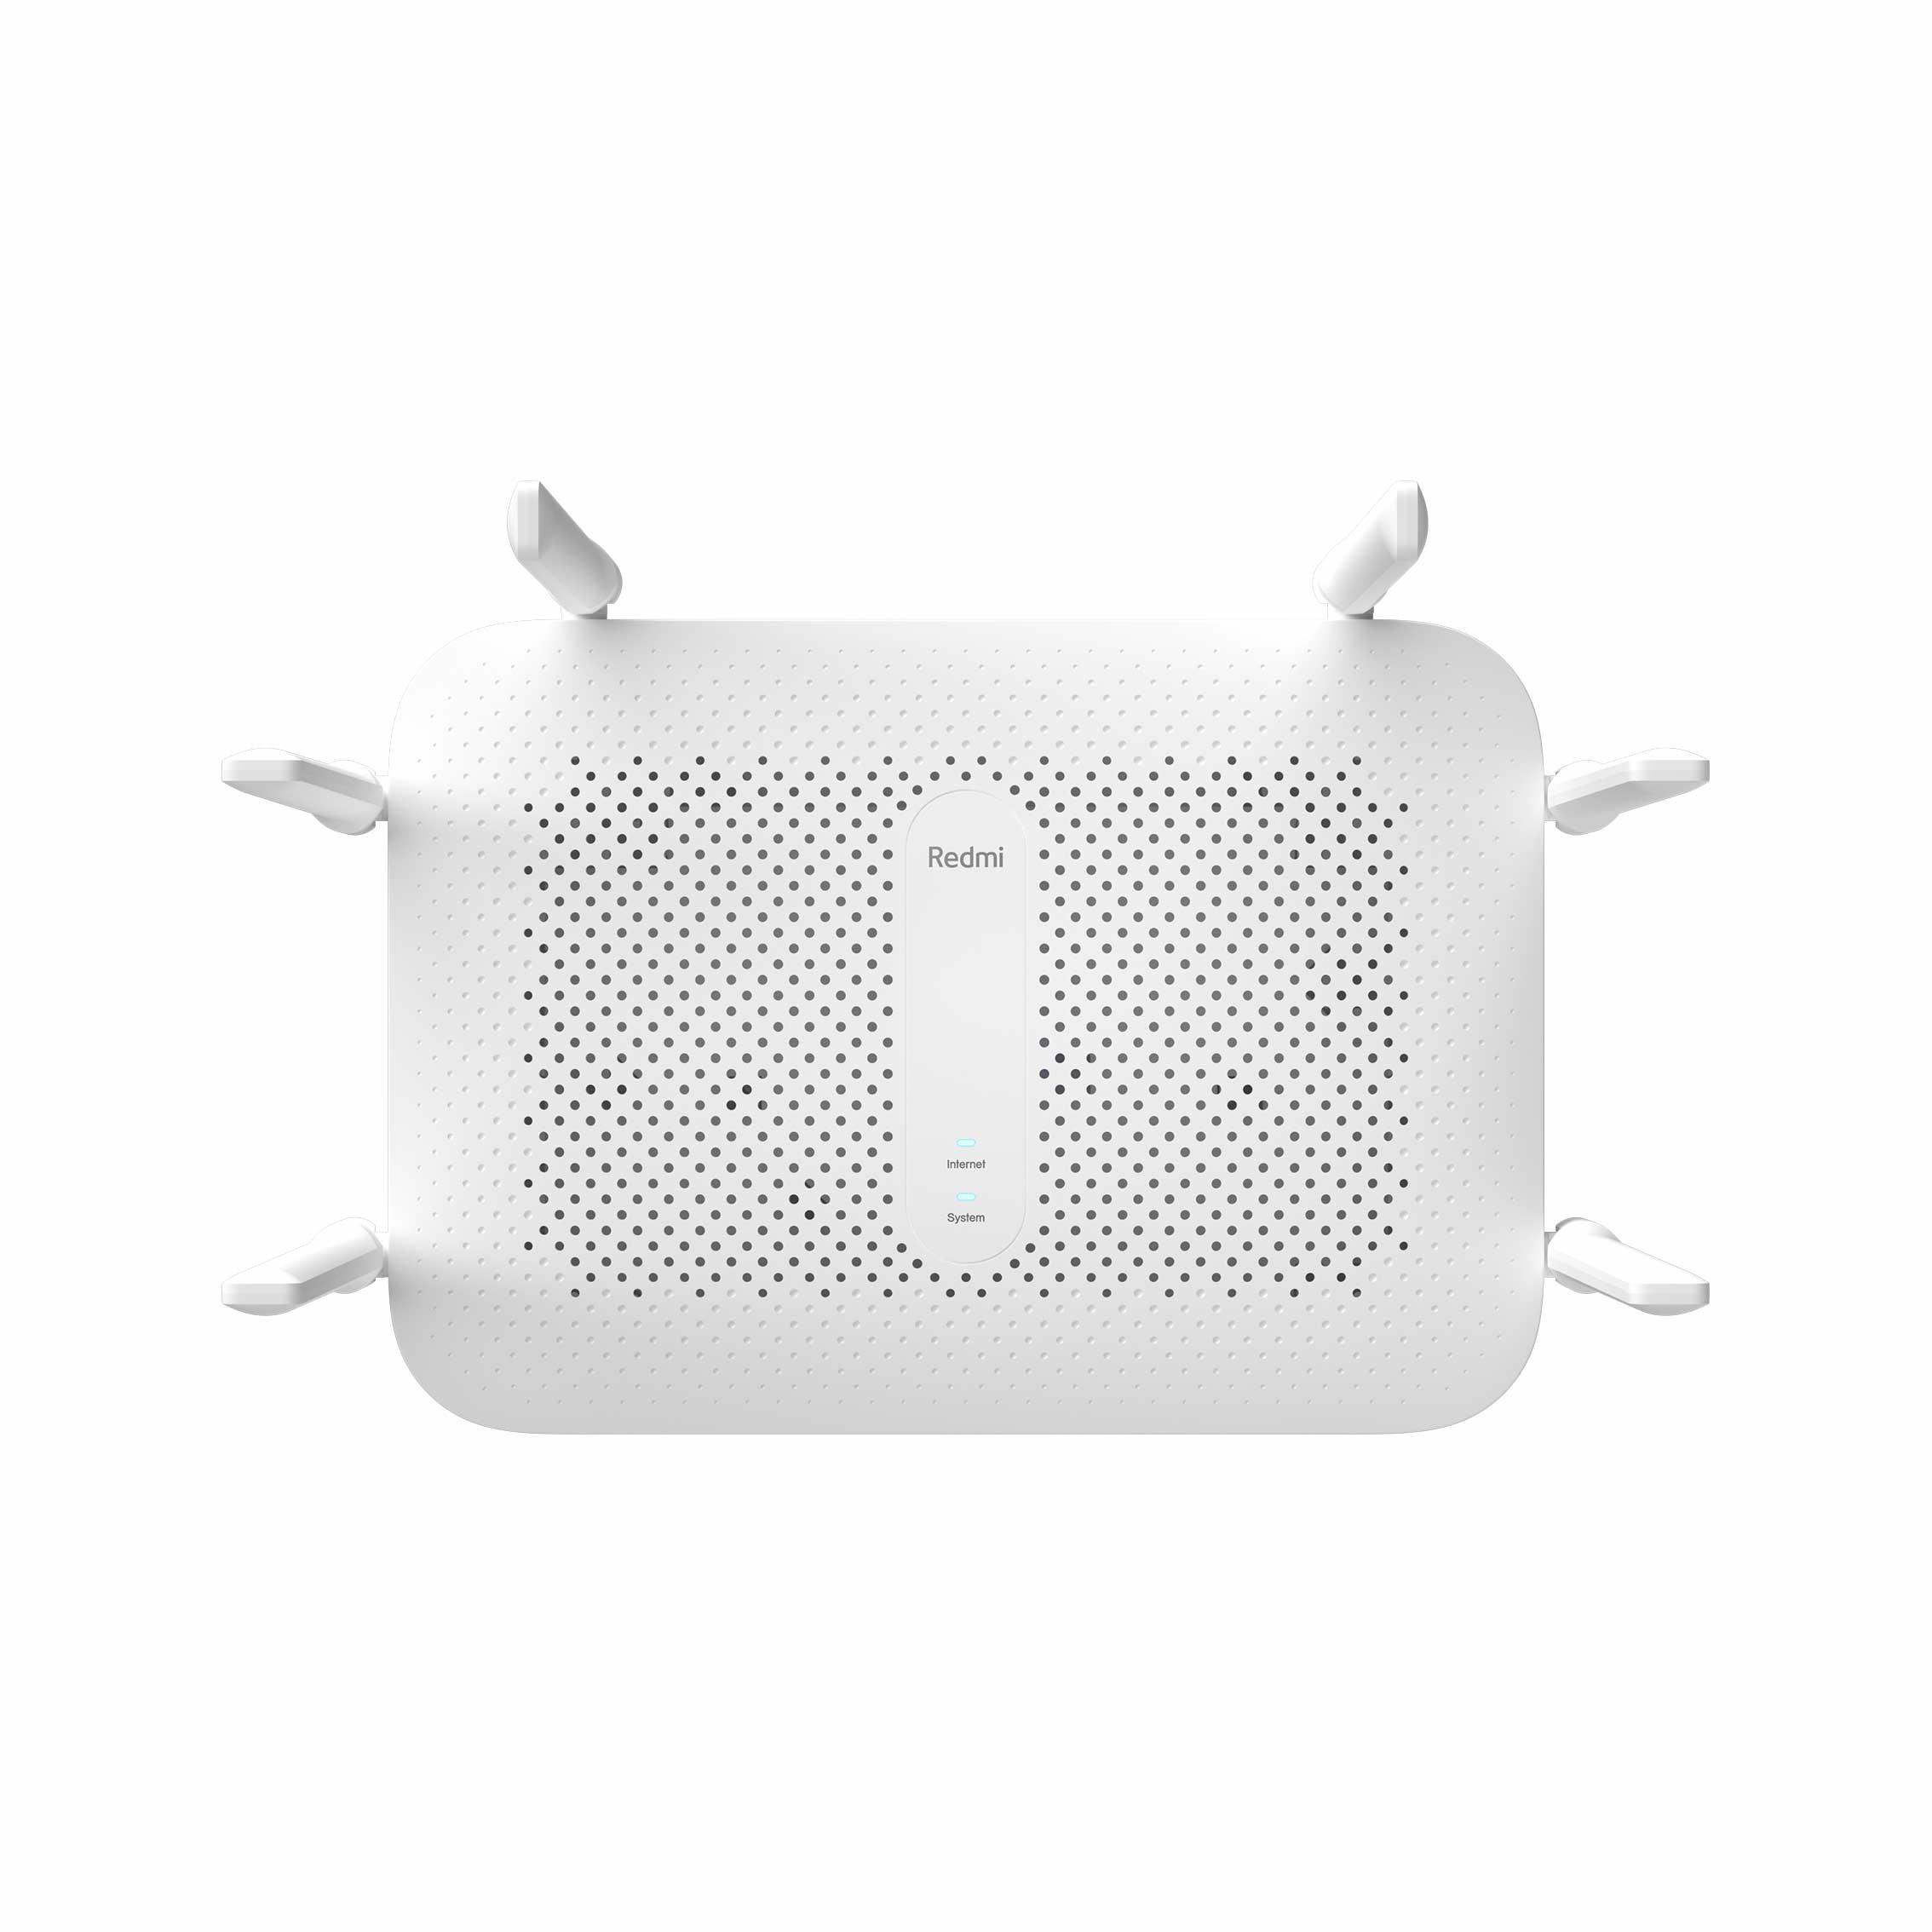 NEUE Xiaomi Redmi Router AX5 WiFi 6 1800 5-Core 256M Speicher Netz Home IoT 4 Signal Verstärker 2,4G 5GHz Sowohl 2 Dual-Band OFDMA 6